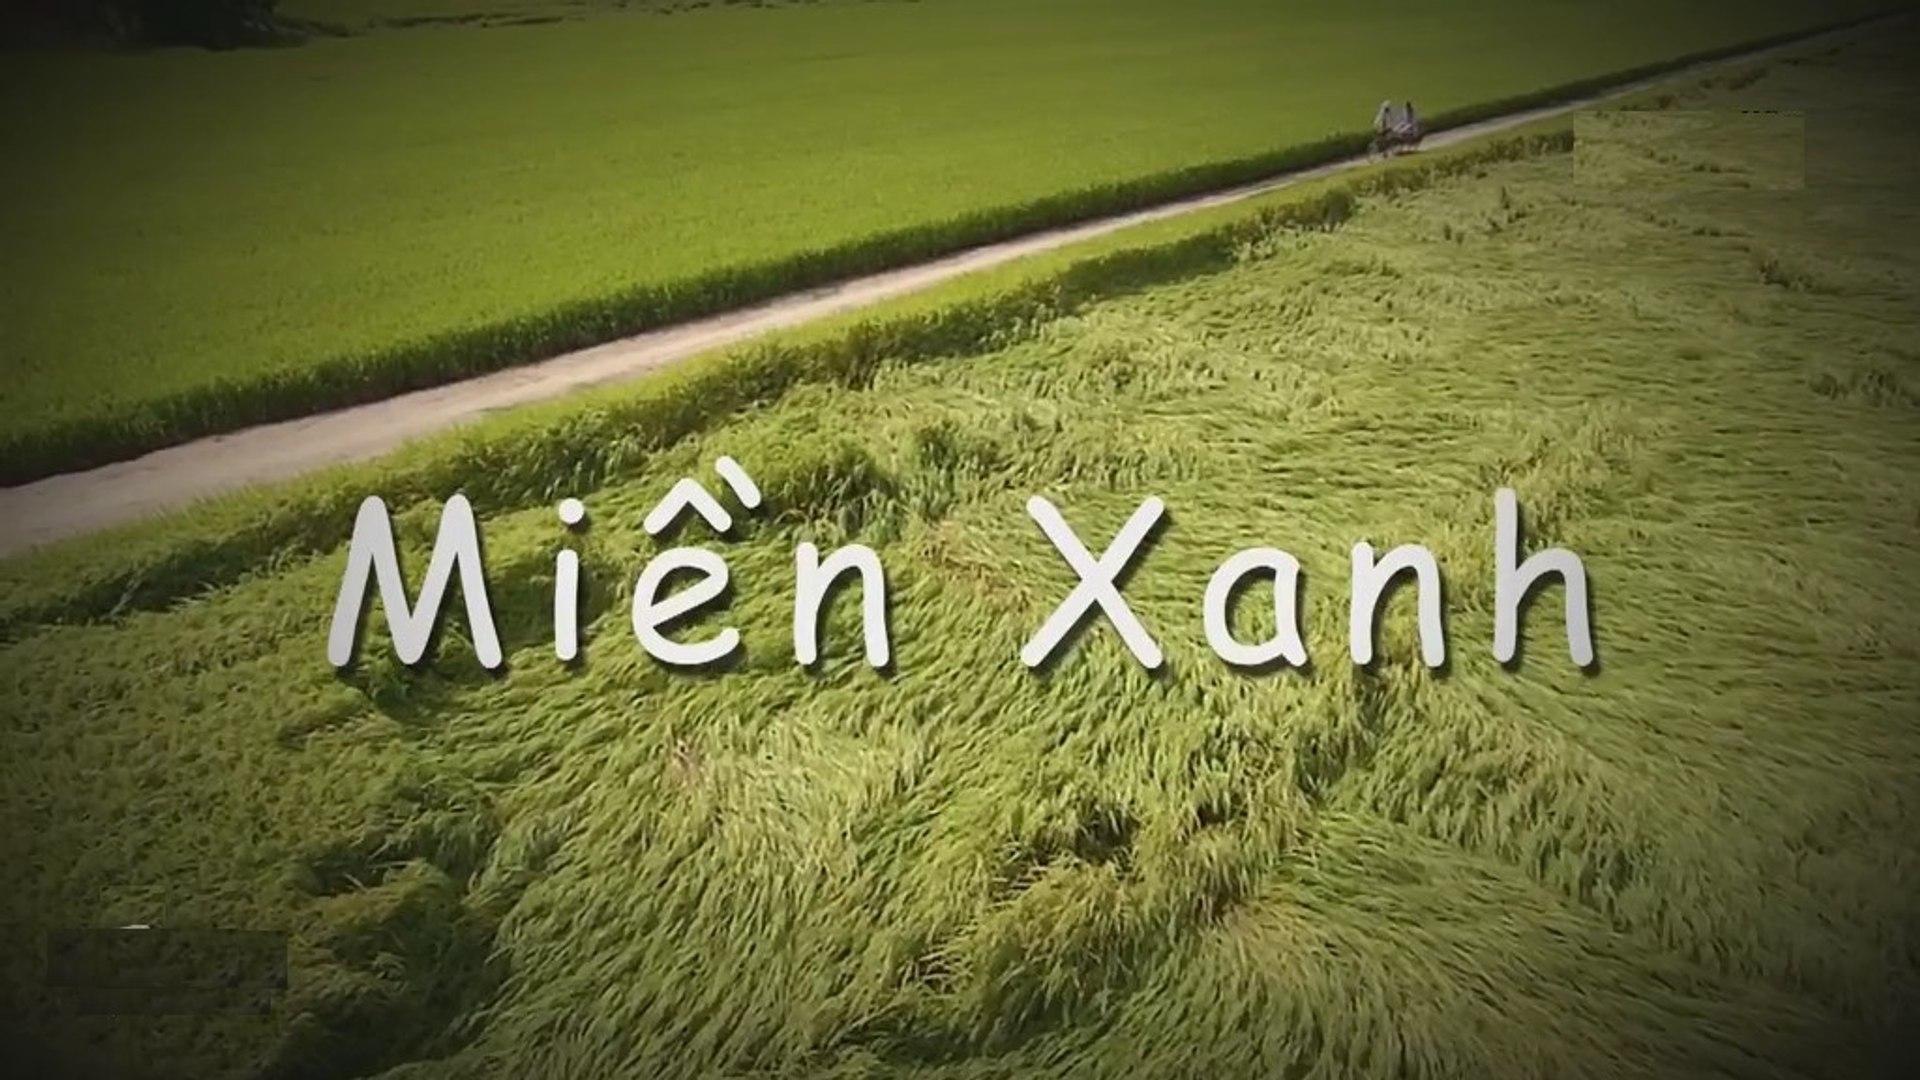 Phim Miền Xanh Tập 29 - Phim Việt Nam (HTV9)